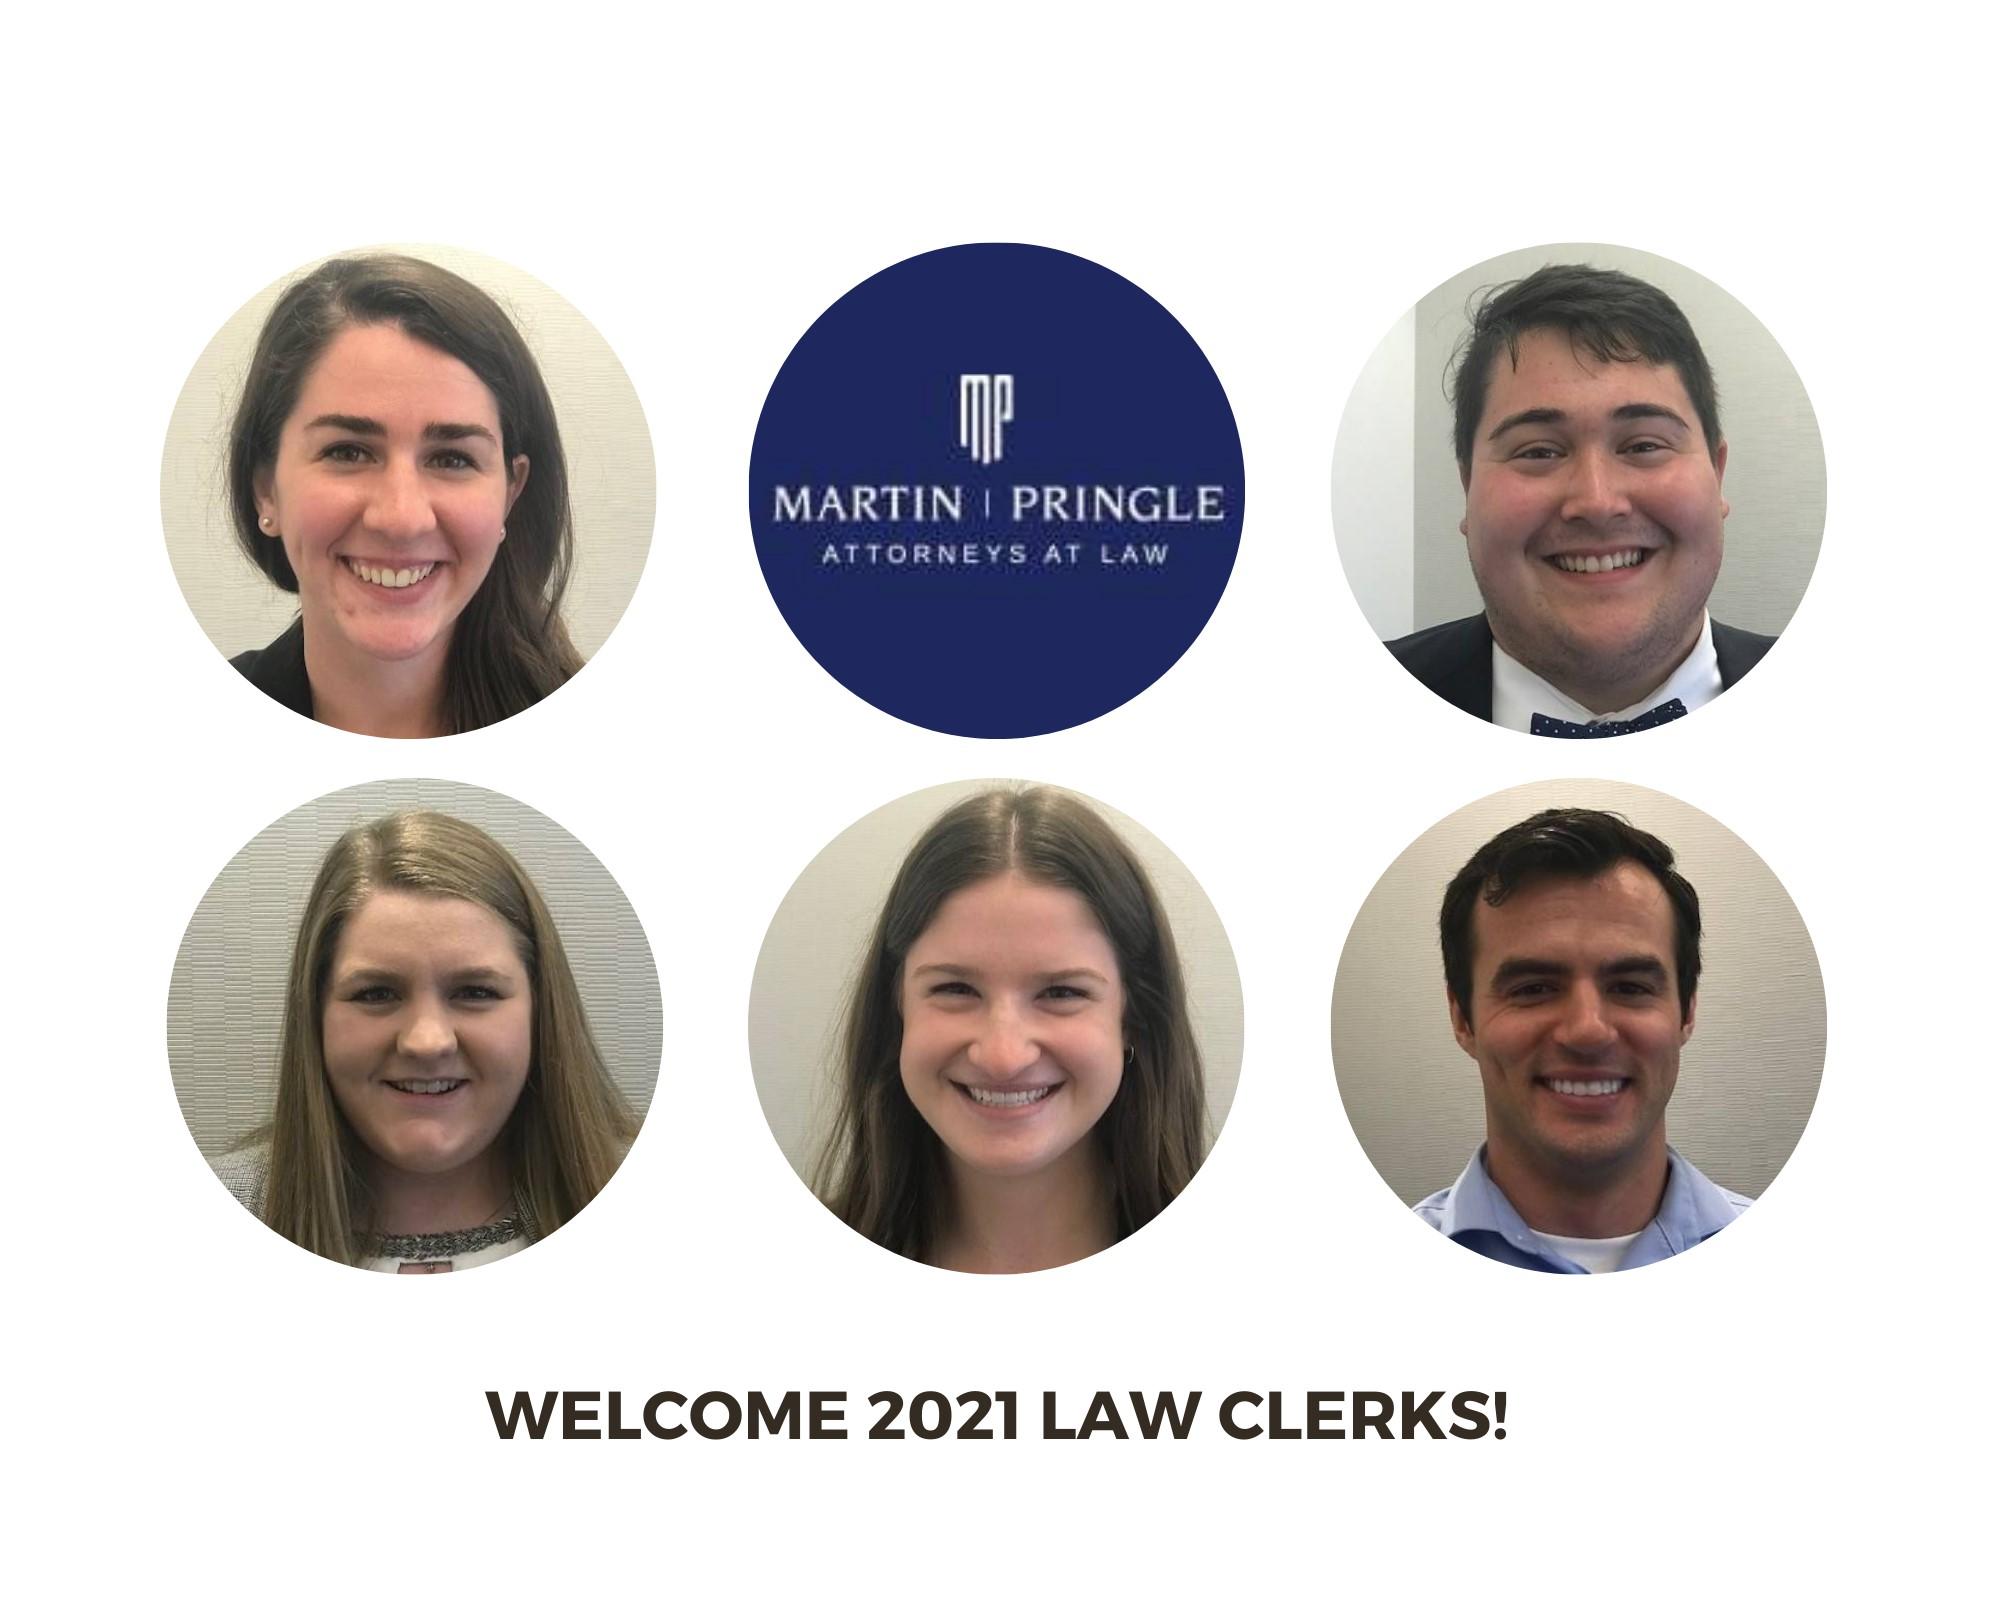 Martin Pringle Welcomes 2021 Summer Associates